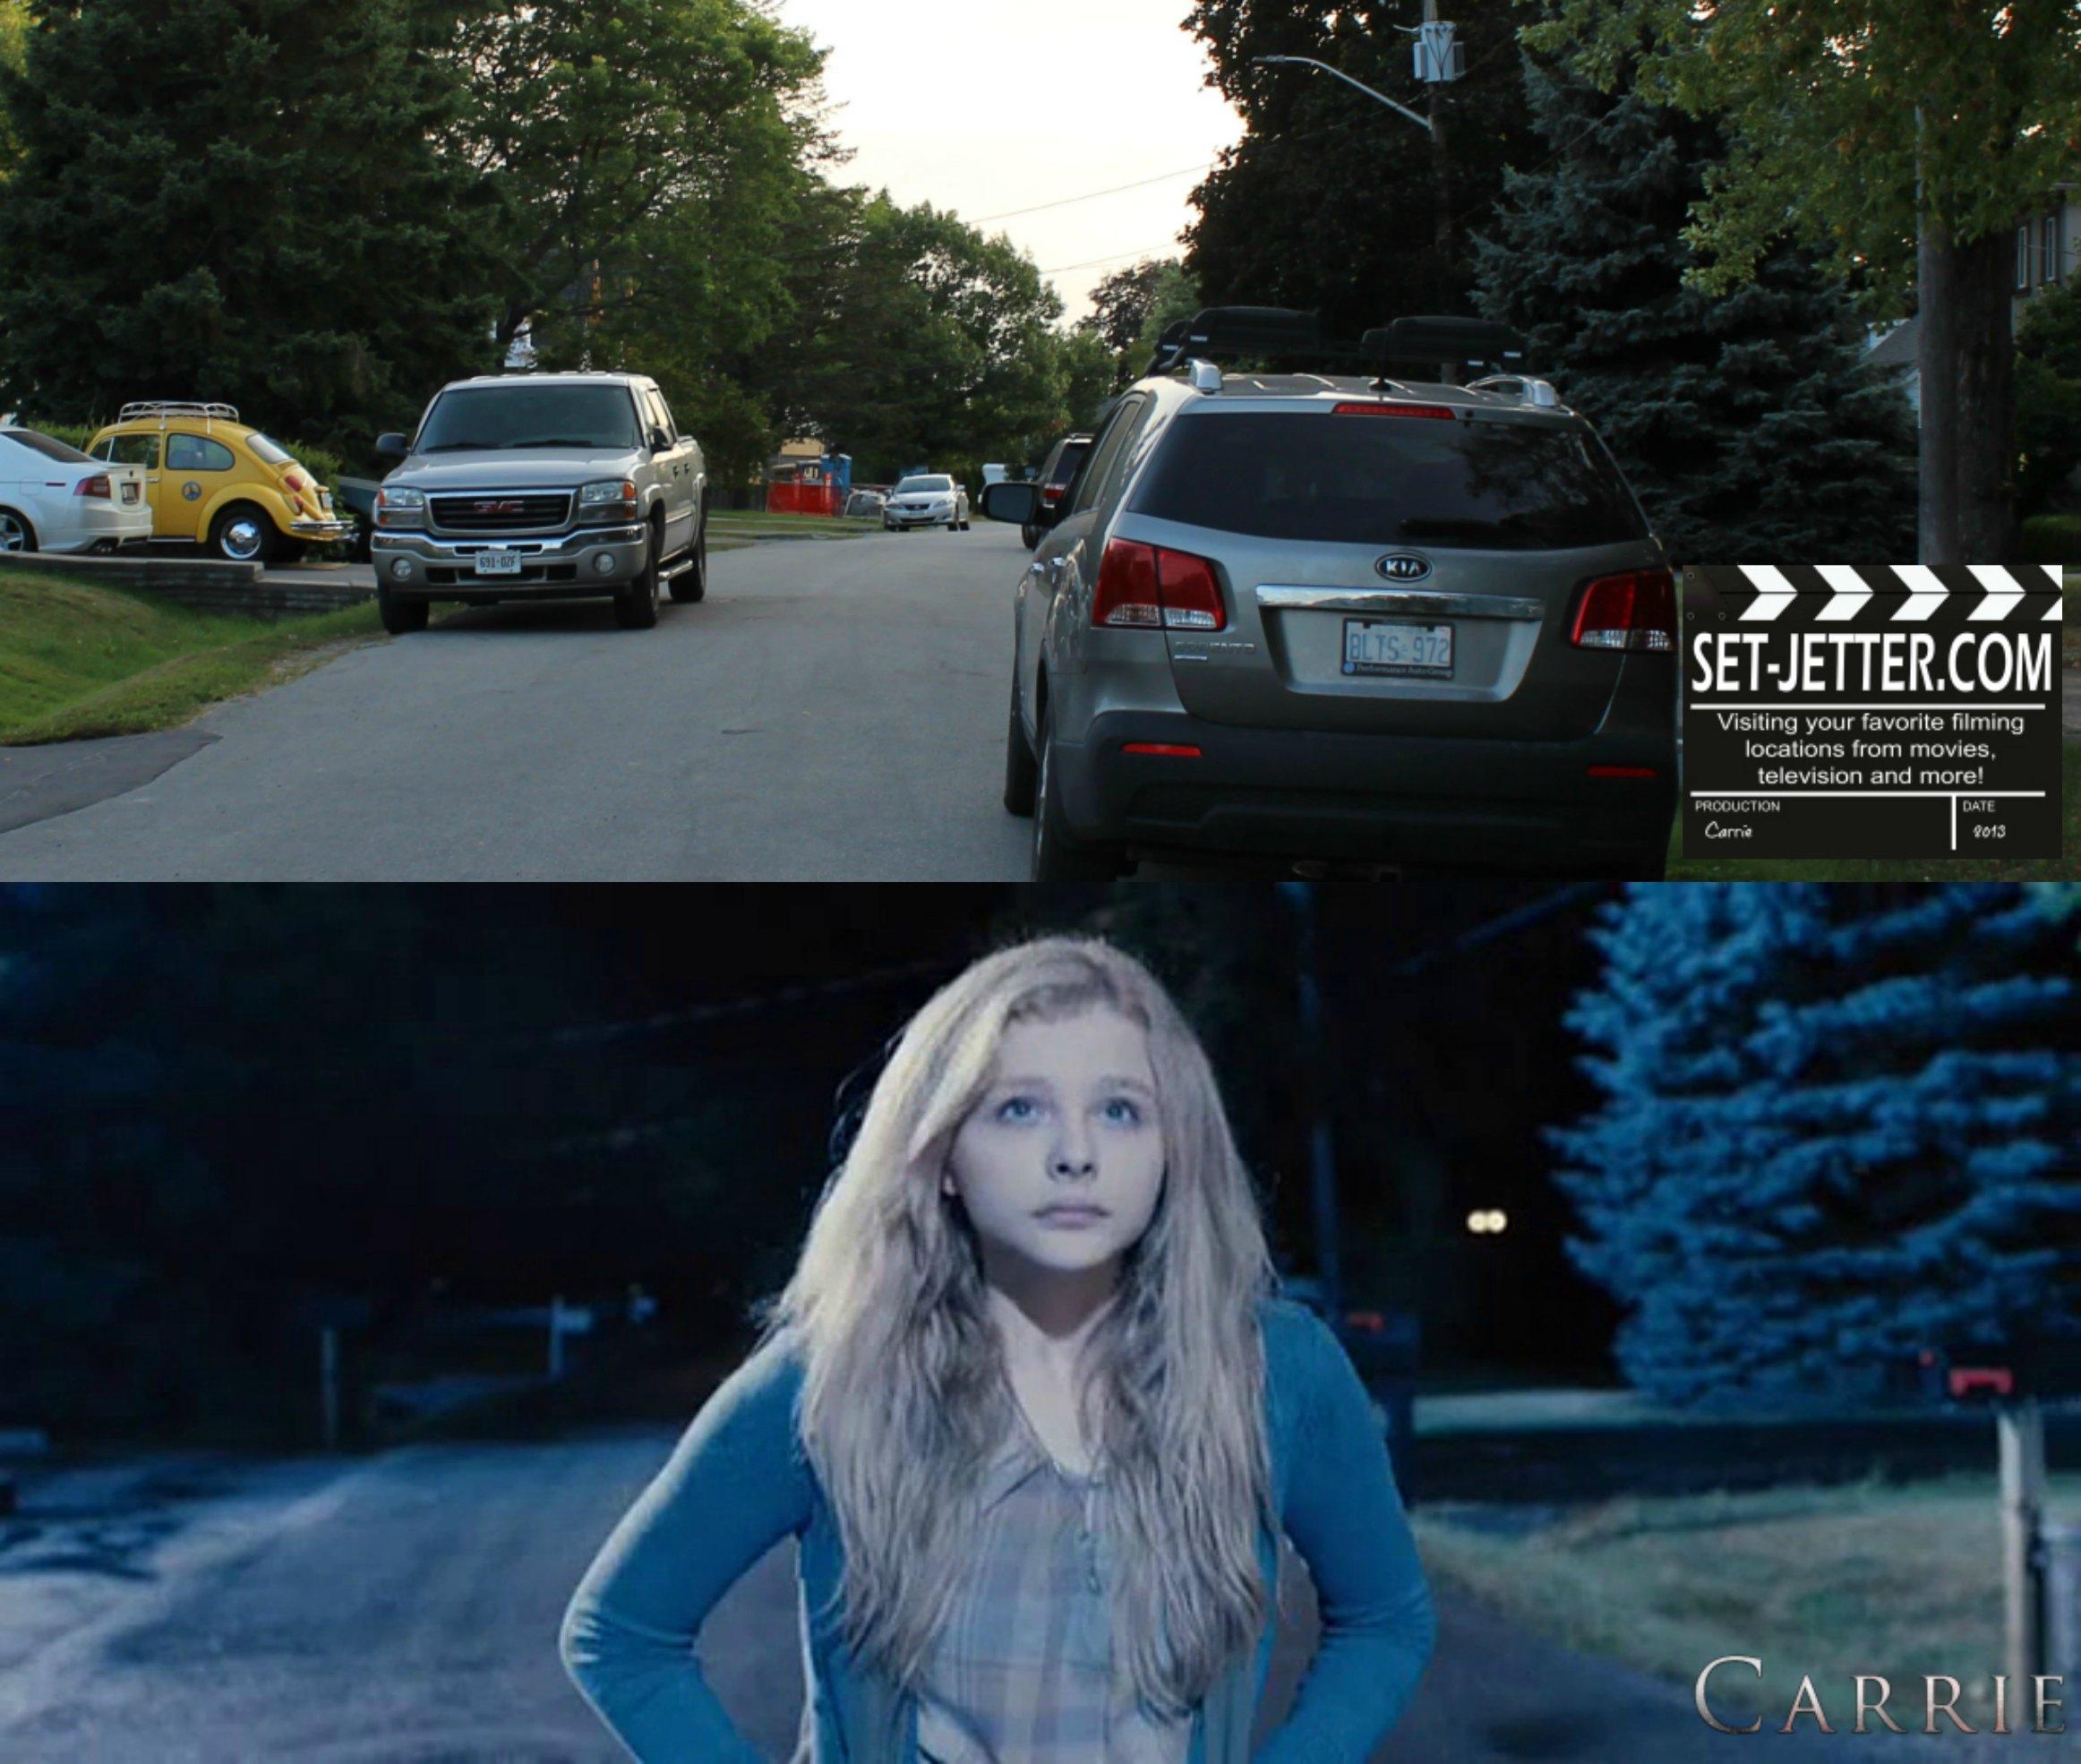 Carrie 2013 comparison 34.jpg